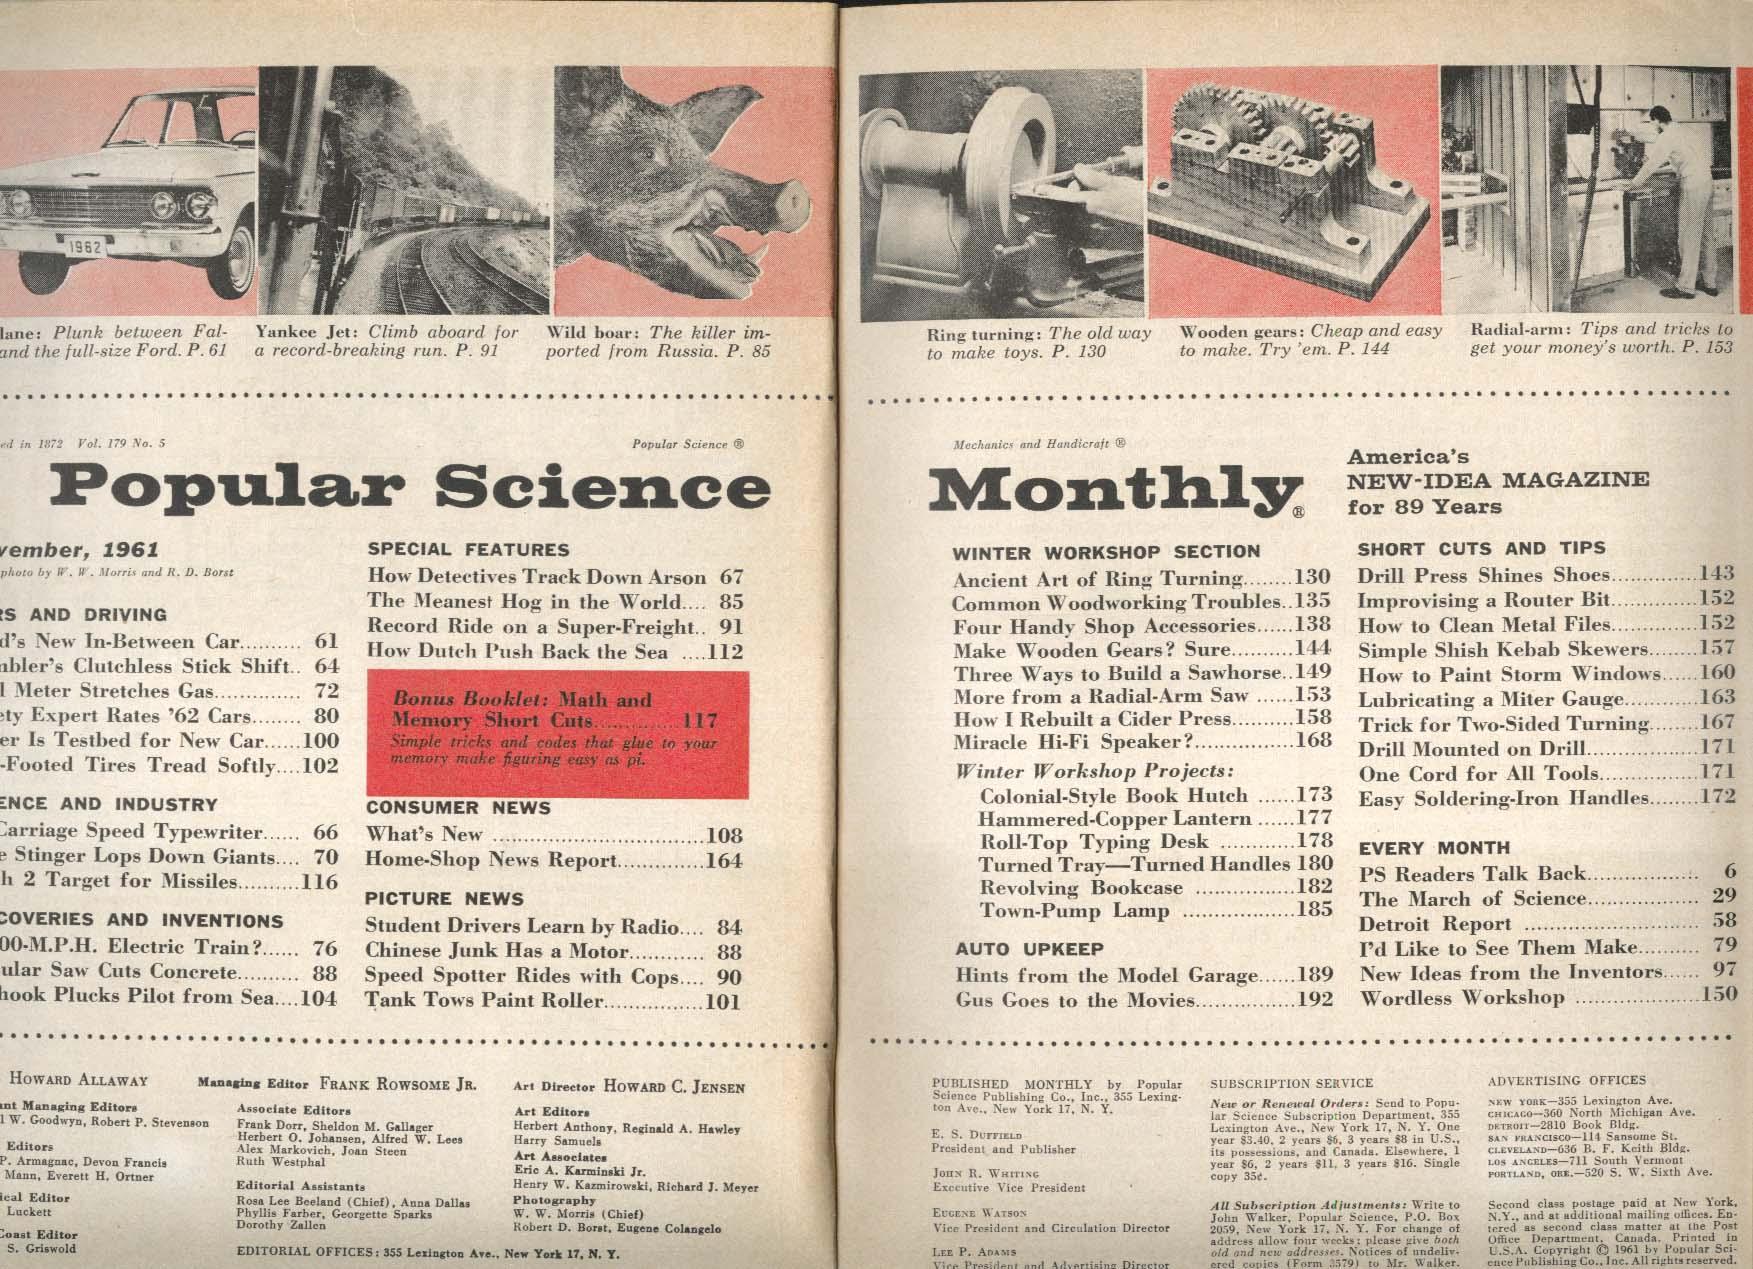 POPULAR SCIENCE 1962 Ford Fairlane Rambler Skyhook Shish Kebab Skewers 11 1961